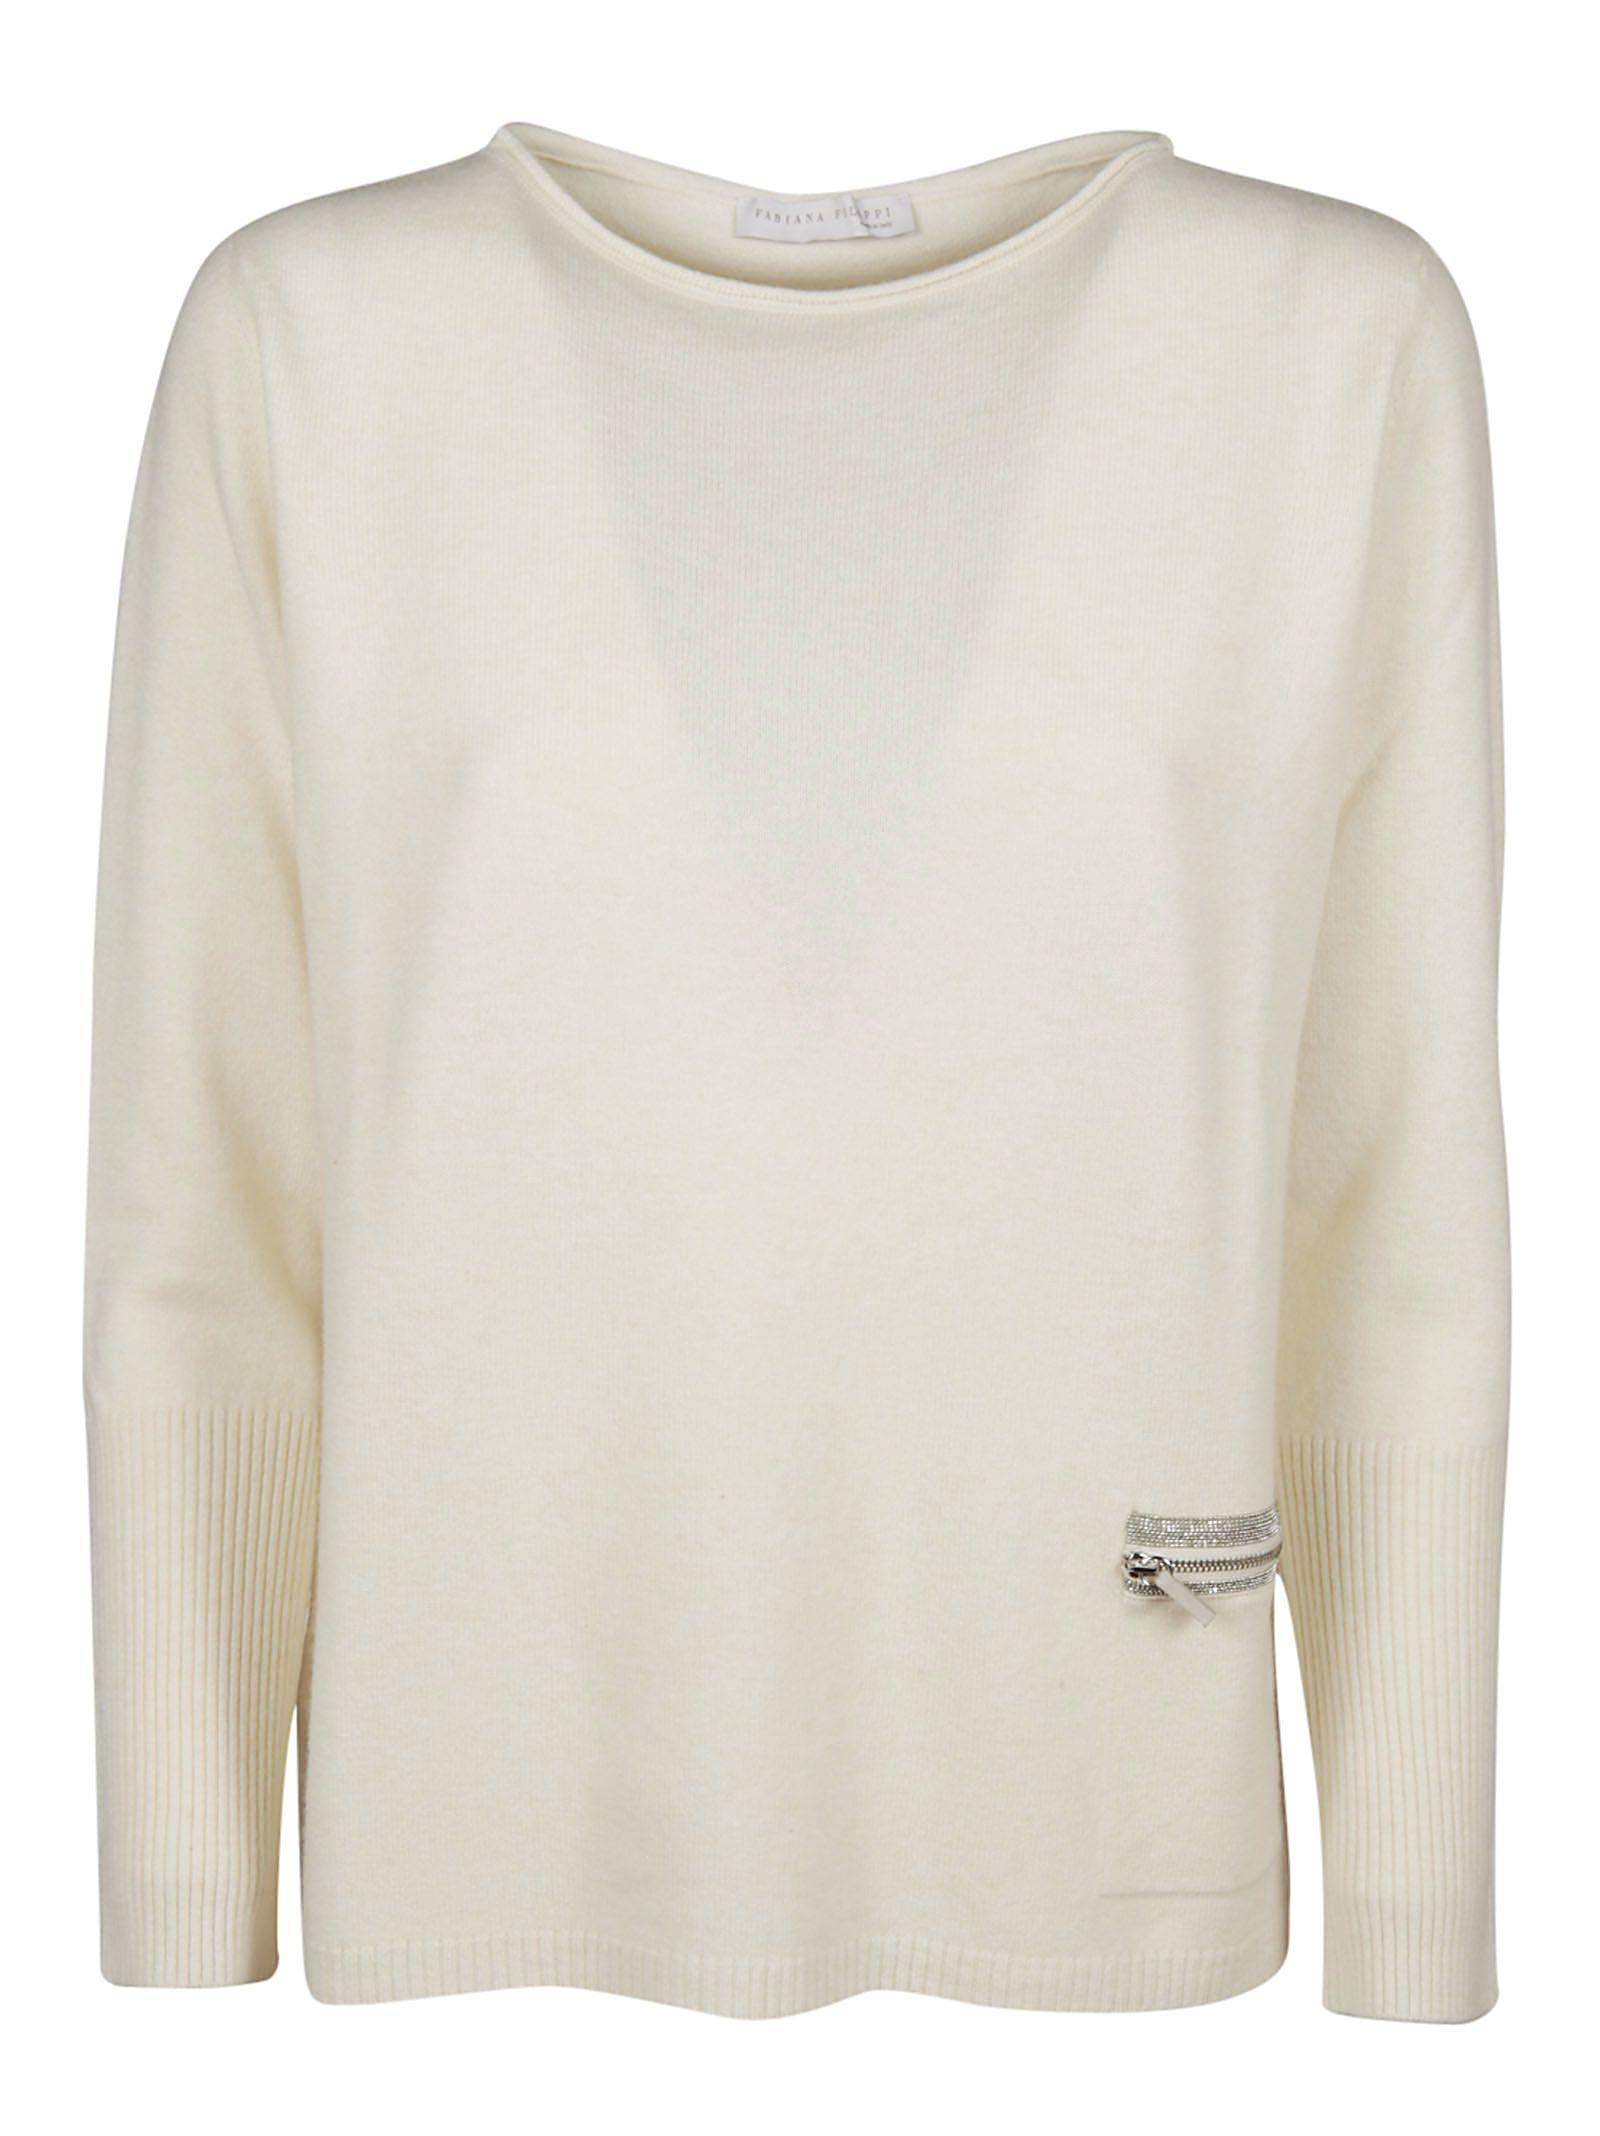 Fabiana Filippi Zipped Pocket Sweater In White